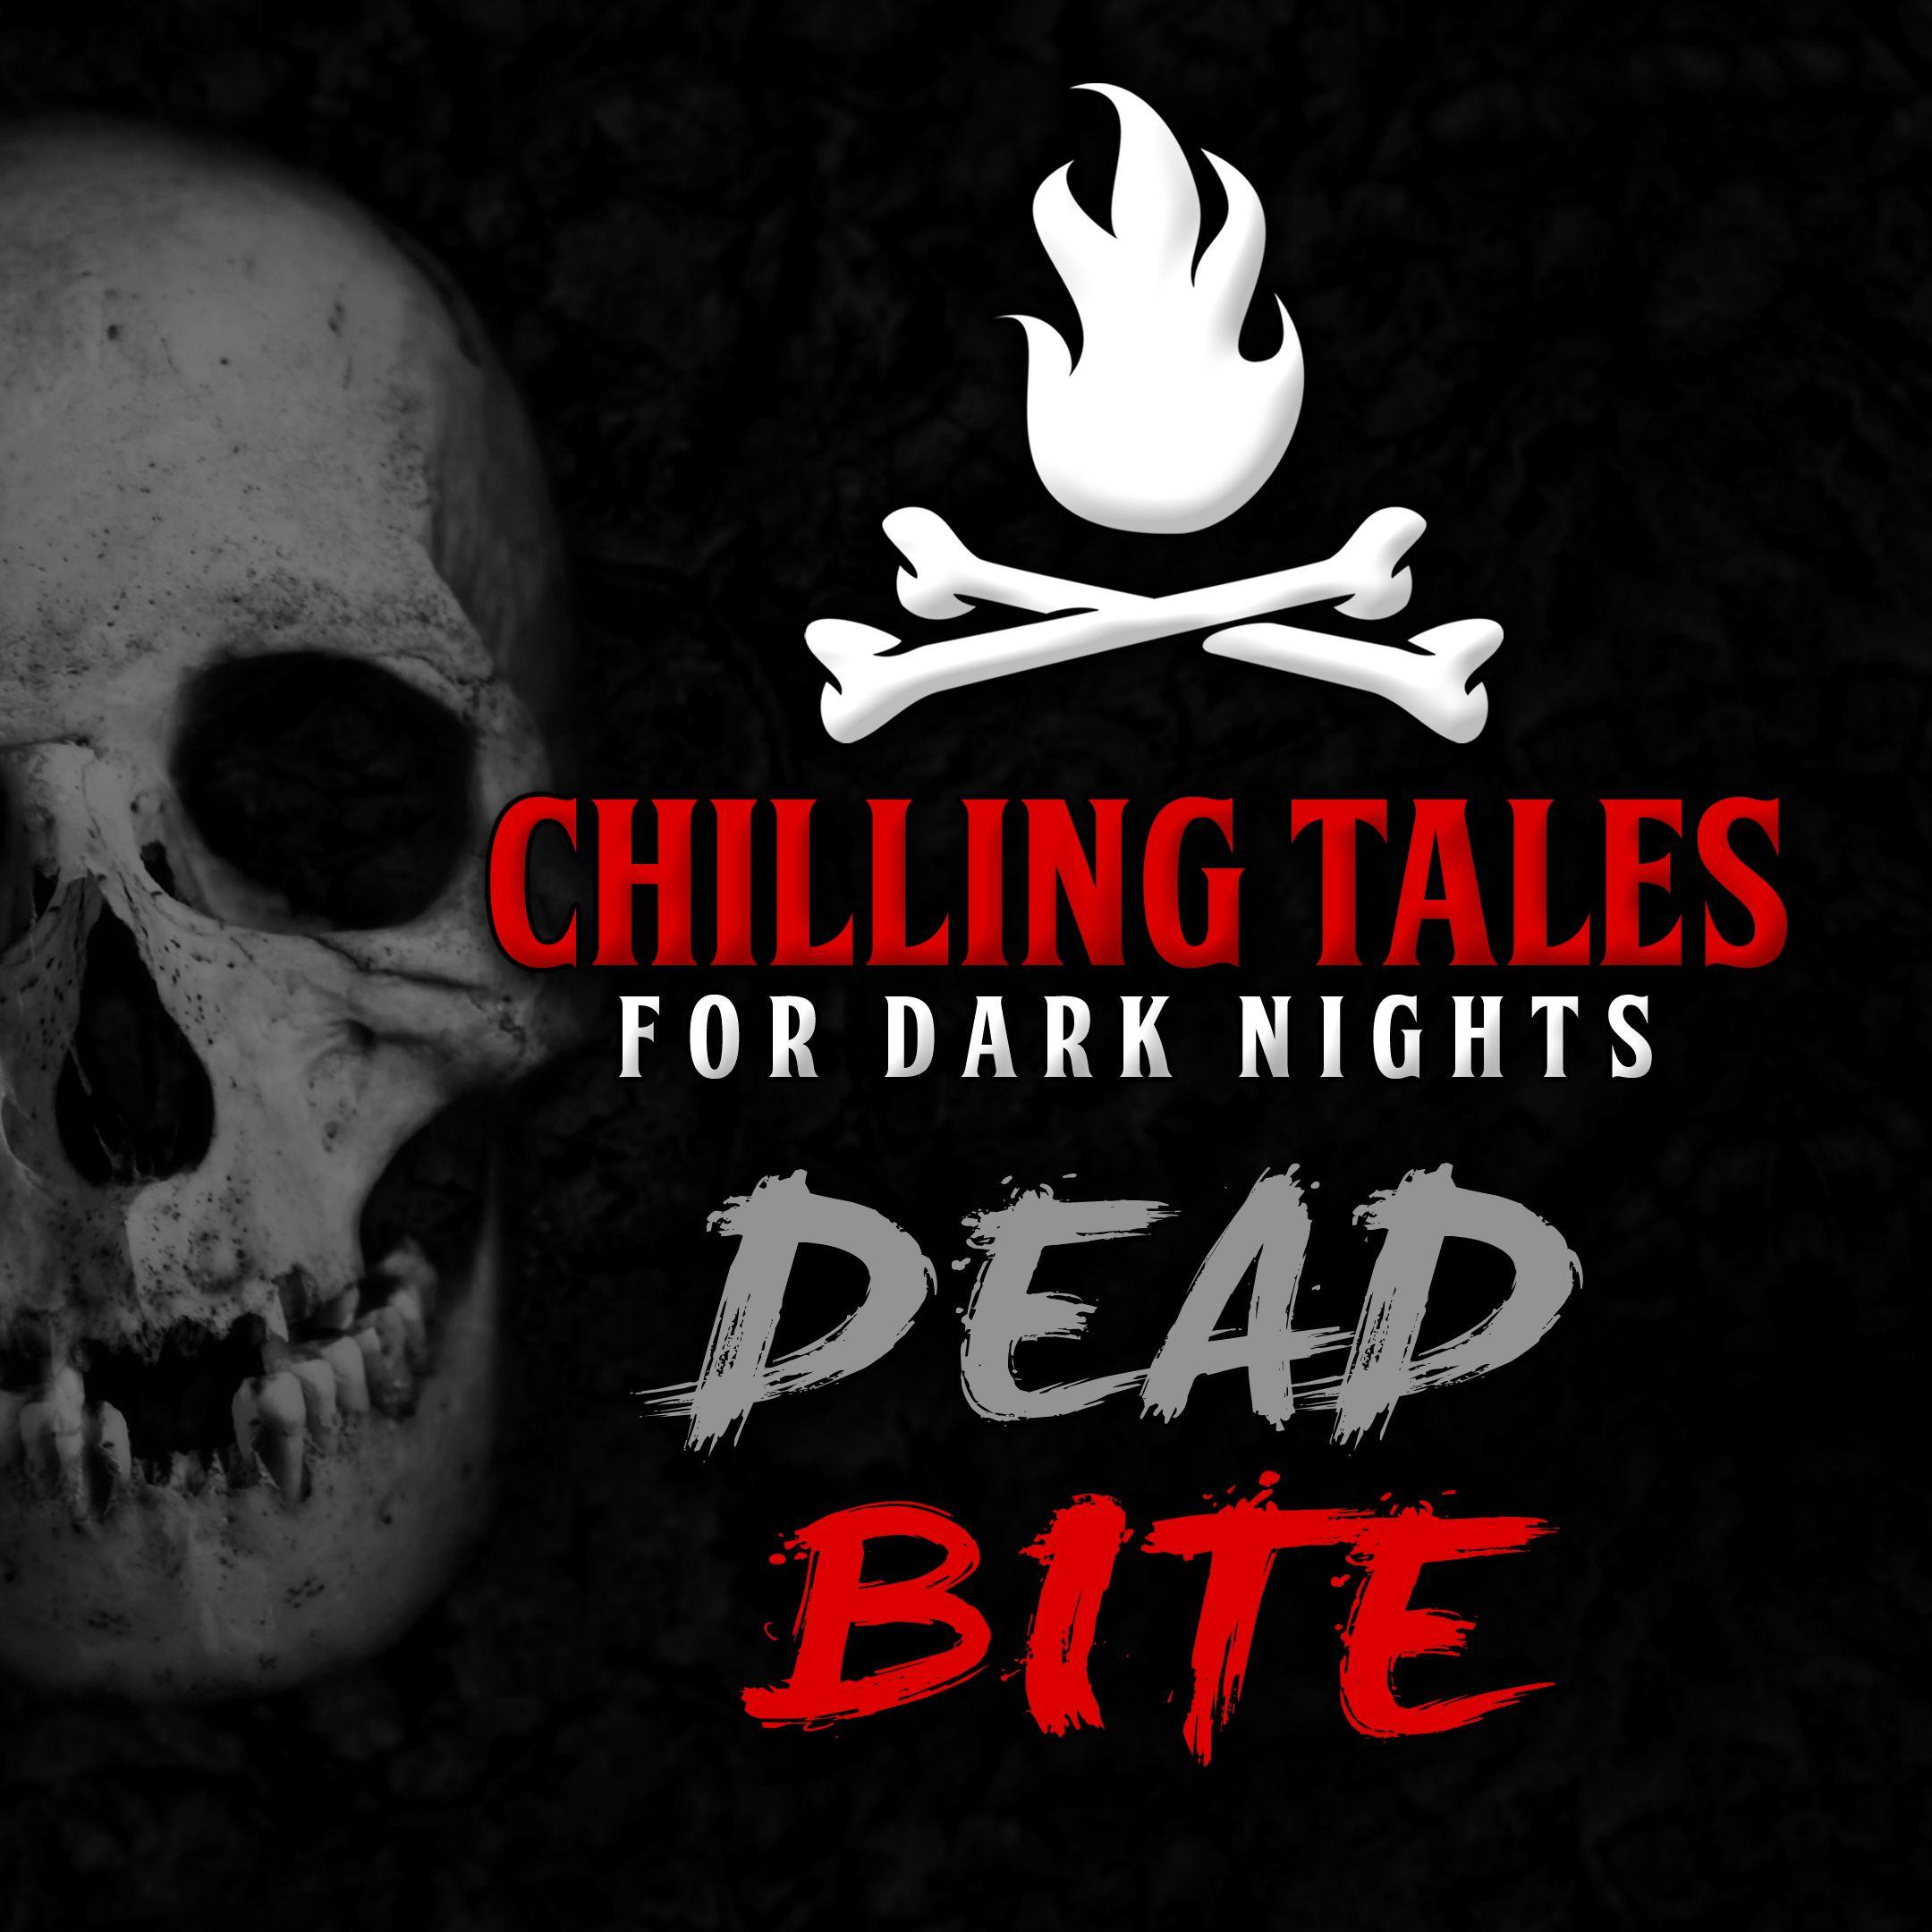 54: Dead Bite – Chilling Tales for Dark Nights